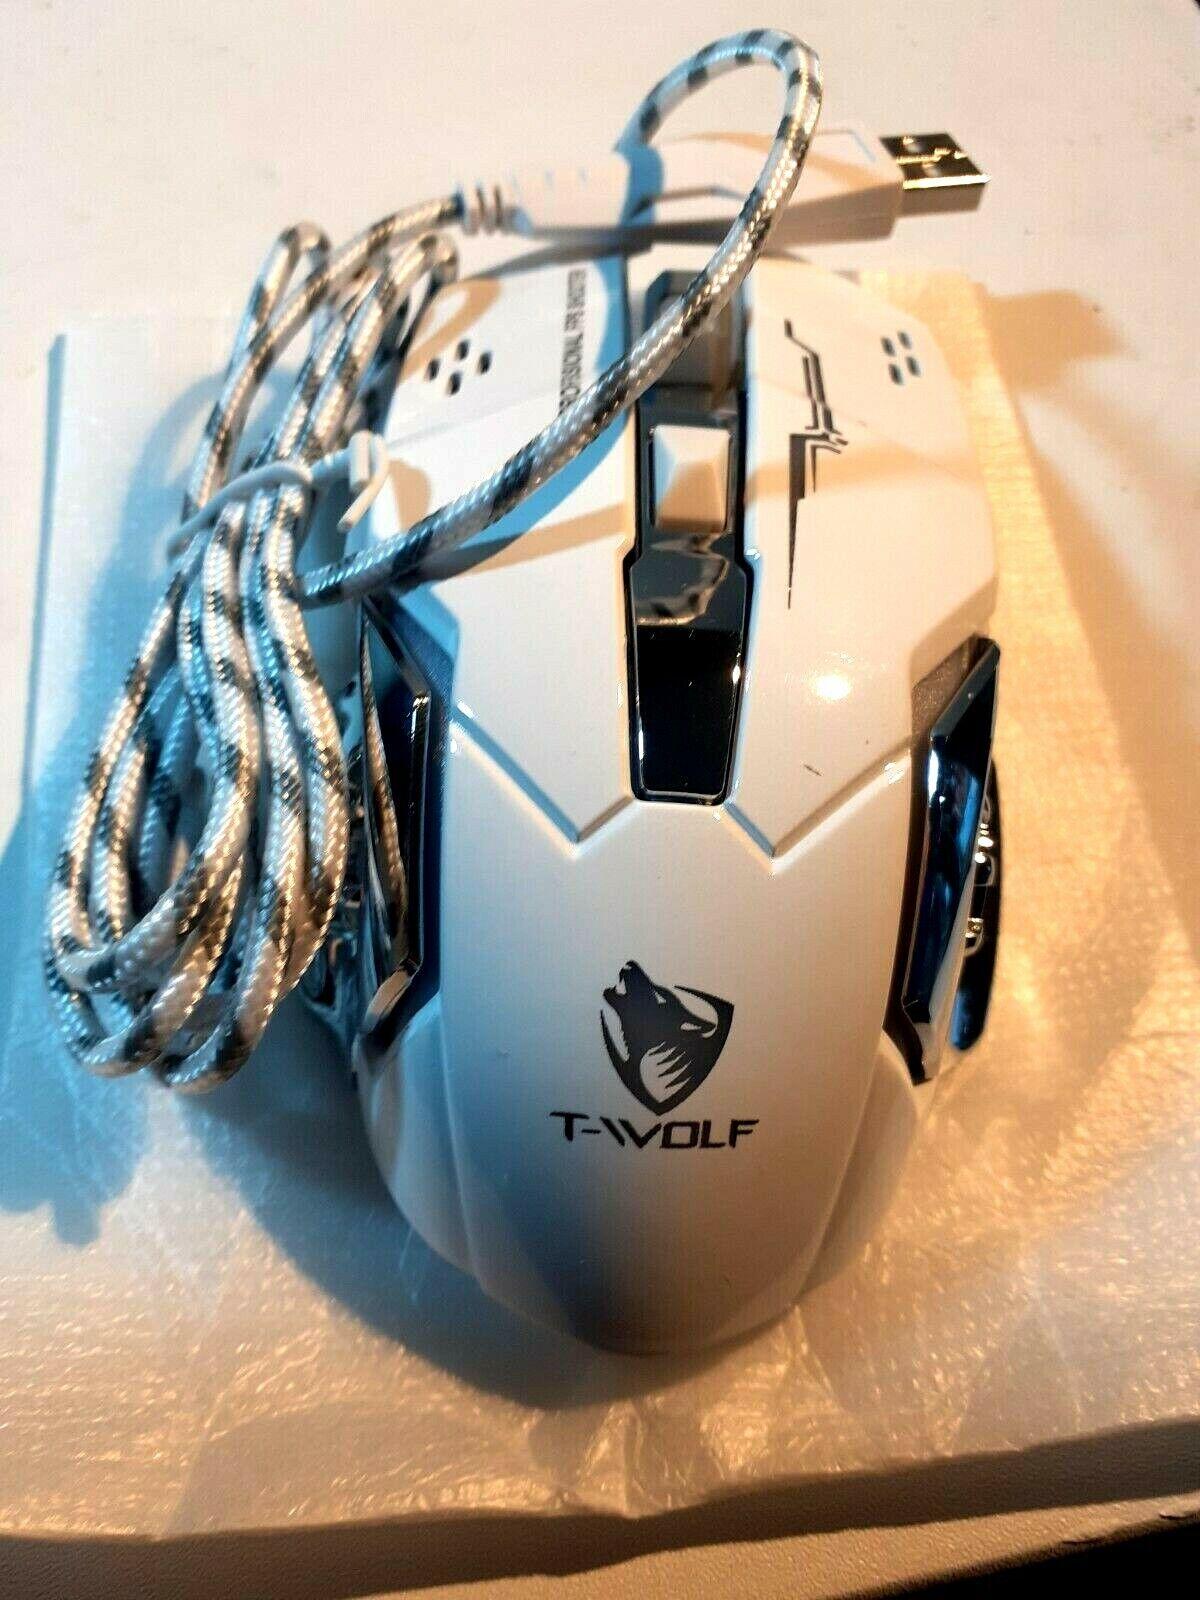 T-Wolf V6 Gaming Mouse - Back Lighting Eye for Style - 3200DPI